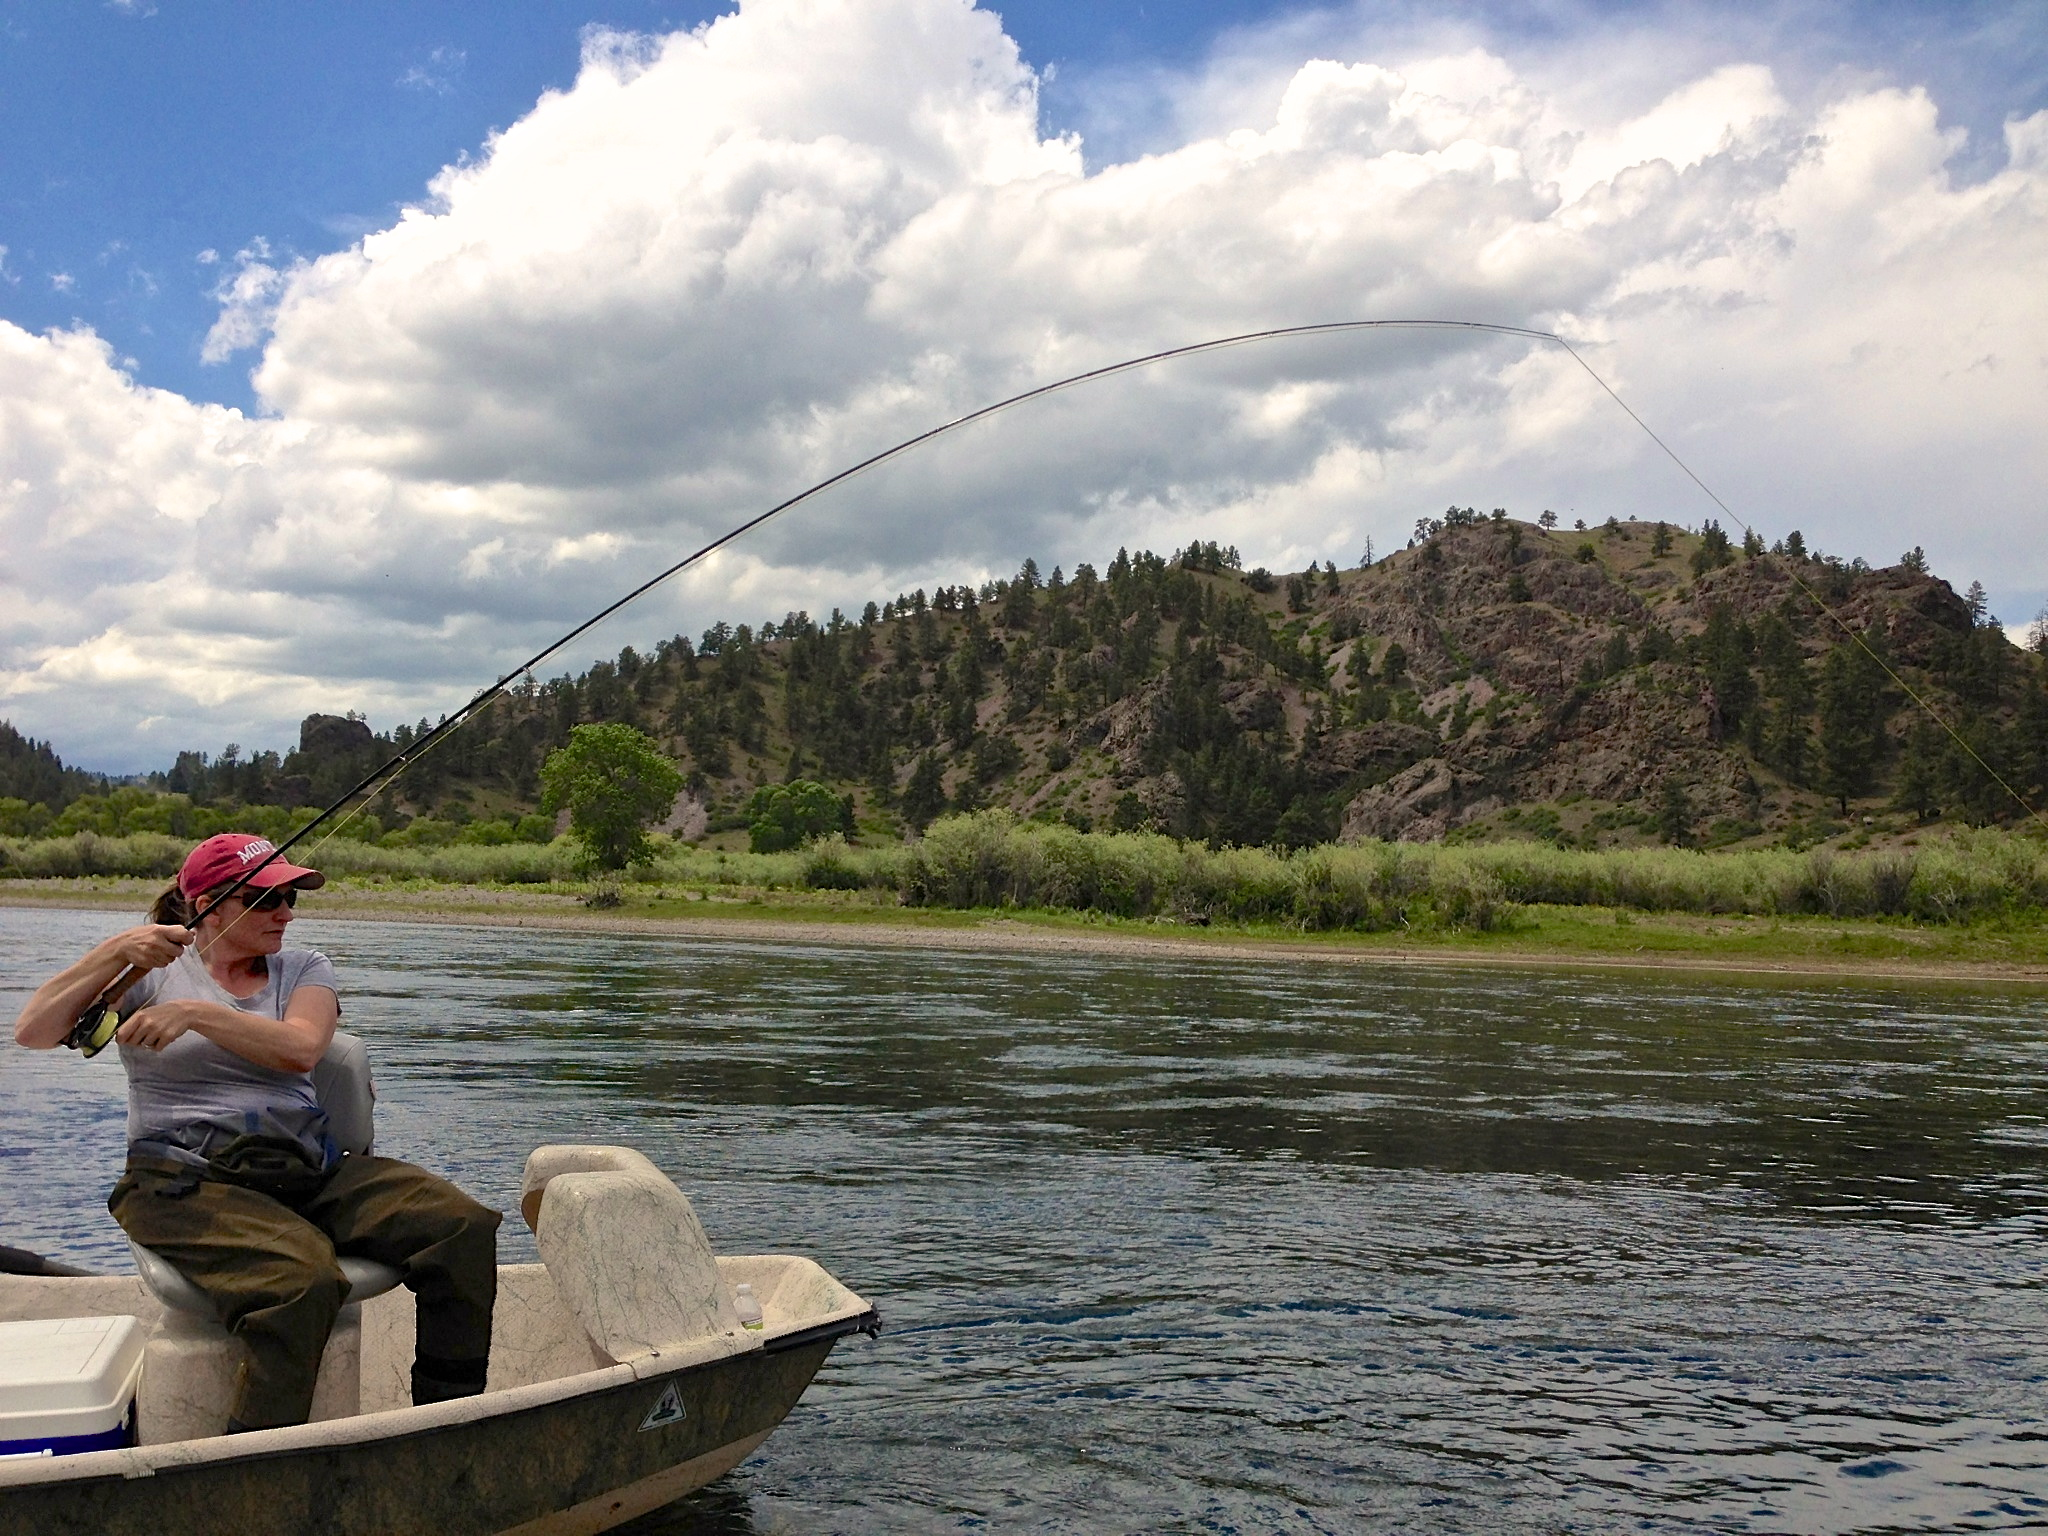 Missouri river fishing report 6 13 13 crosscurrents fly for Missouri river fishing